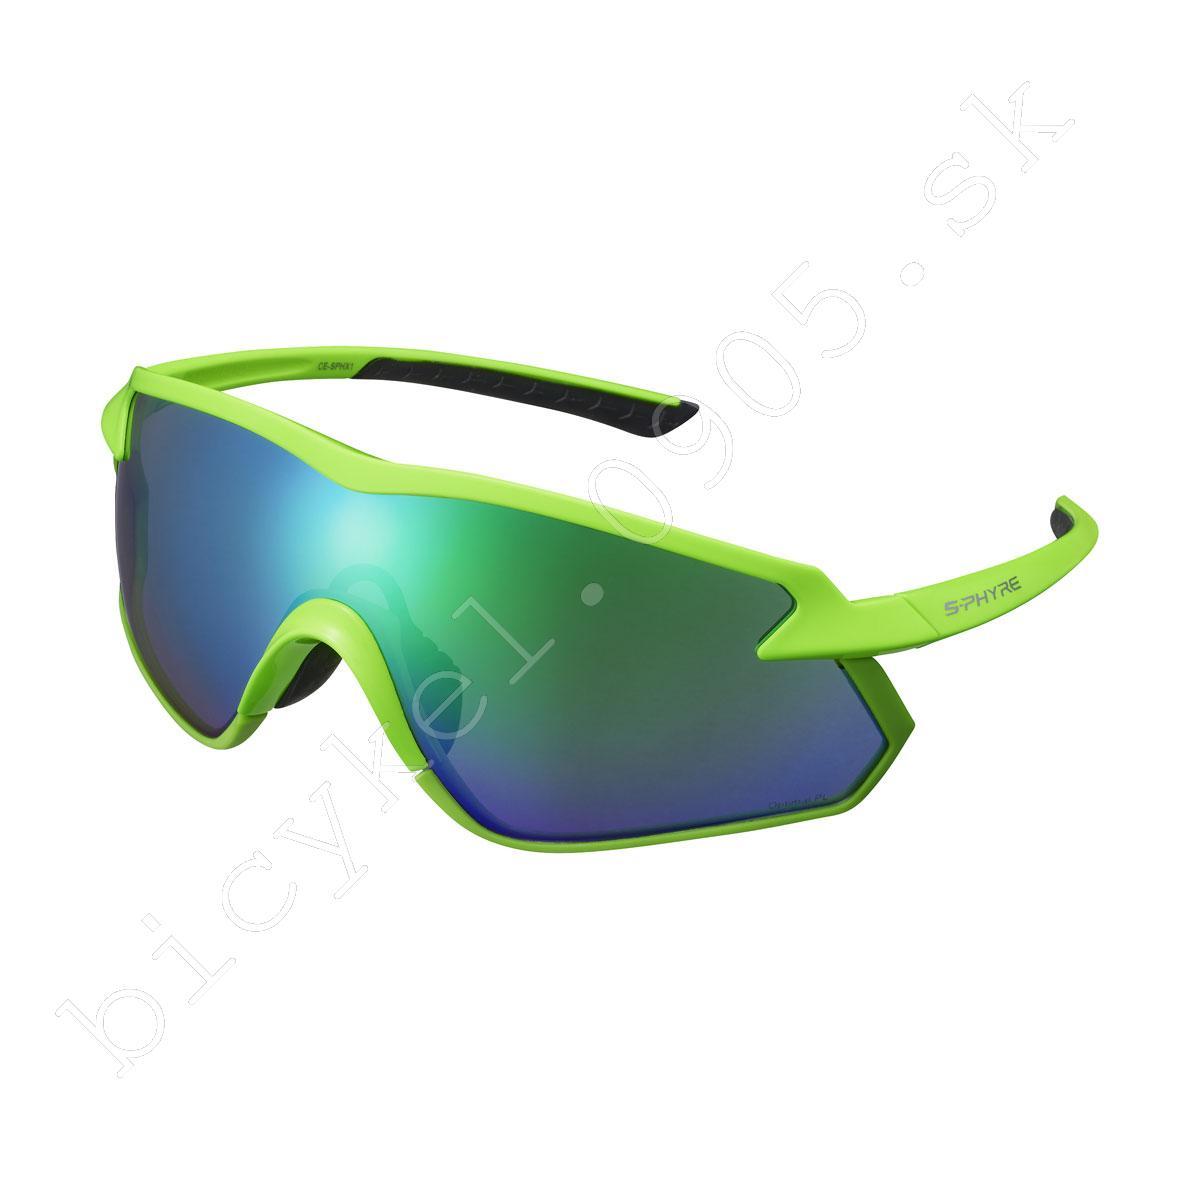 2b68247b2 bicykel,bicykle Okuliare S-PHYRE X neon zelené Optimal PL MLC/cloud ...